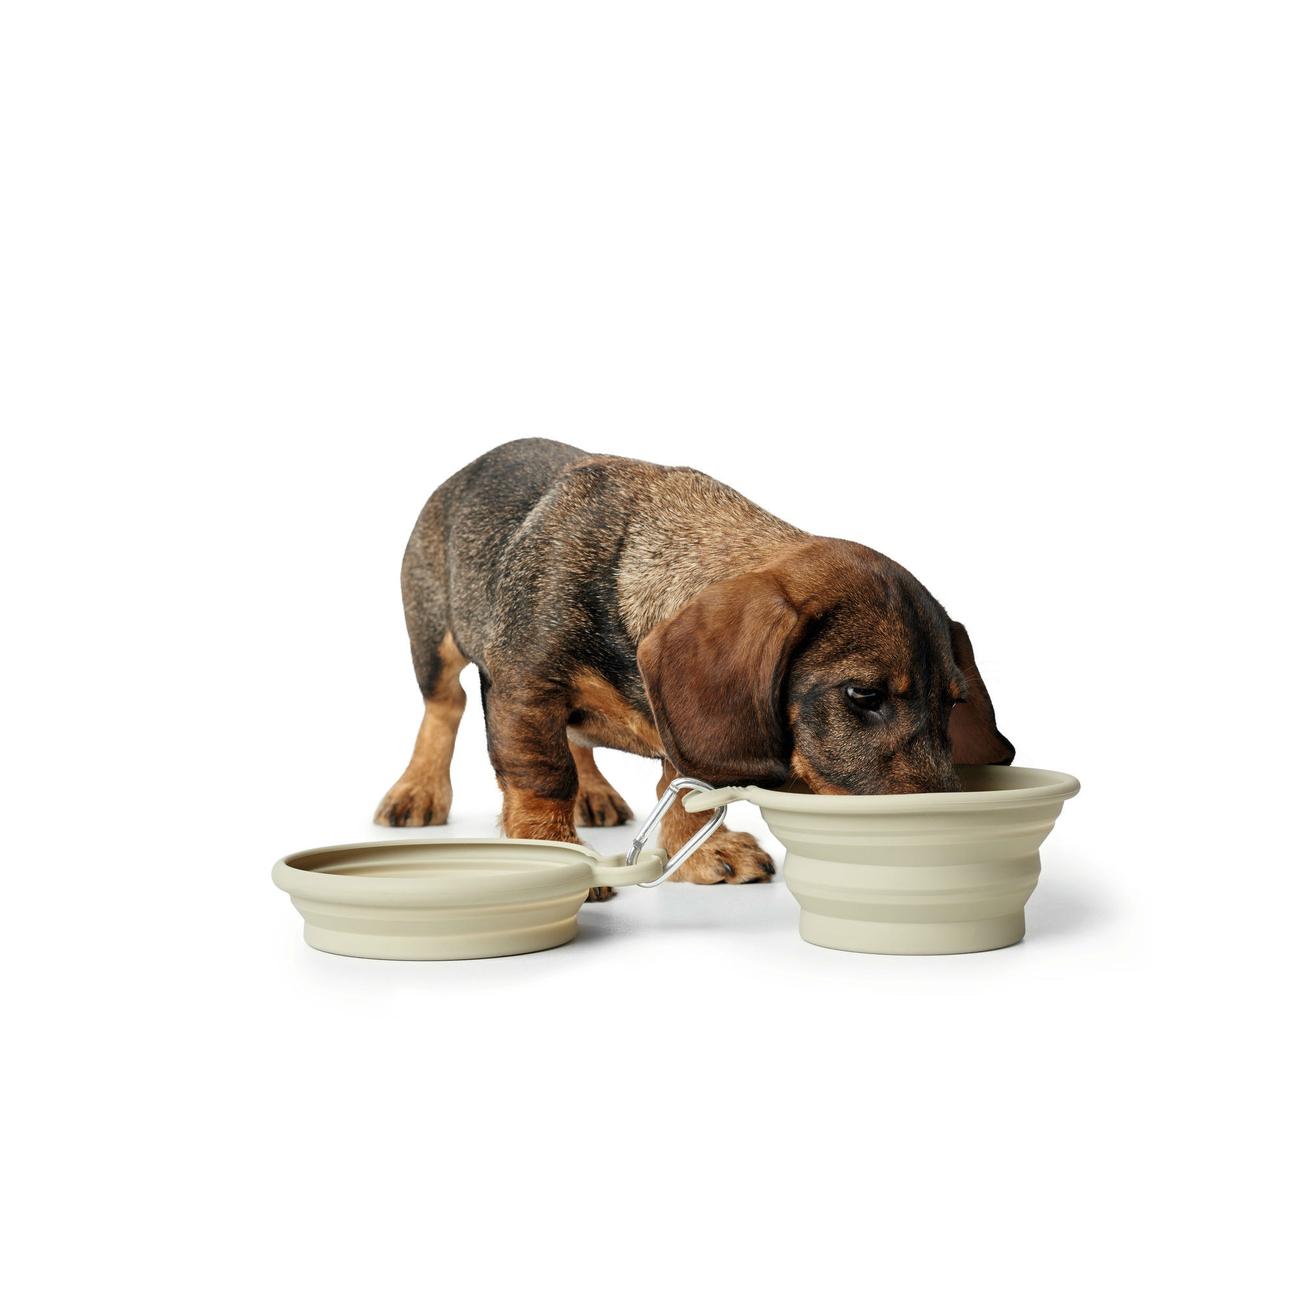 Hunter Silikon Reisenapf List für Hunde 65135, Bild 7